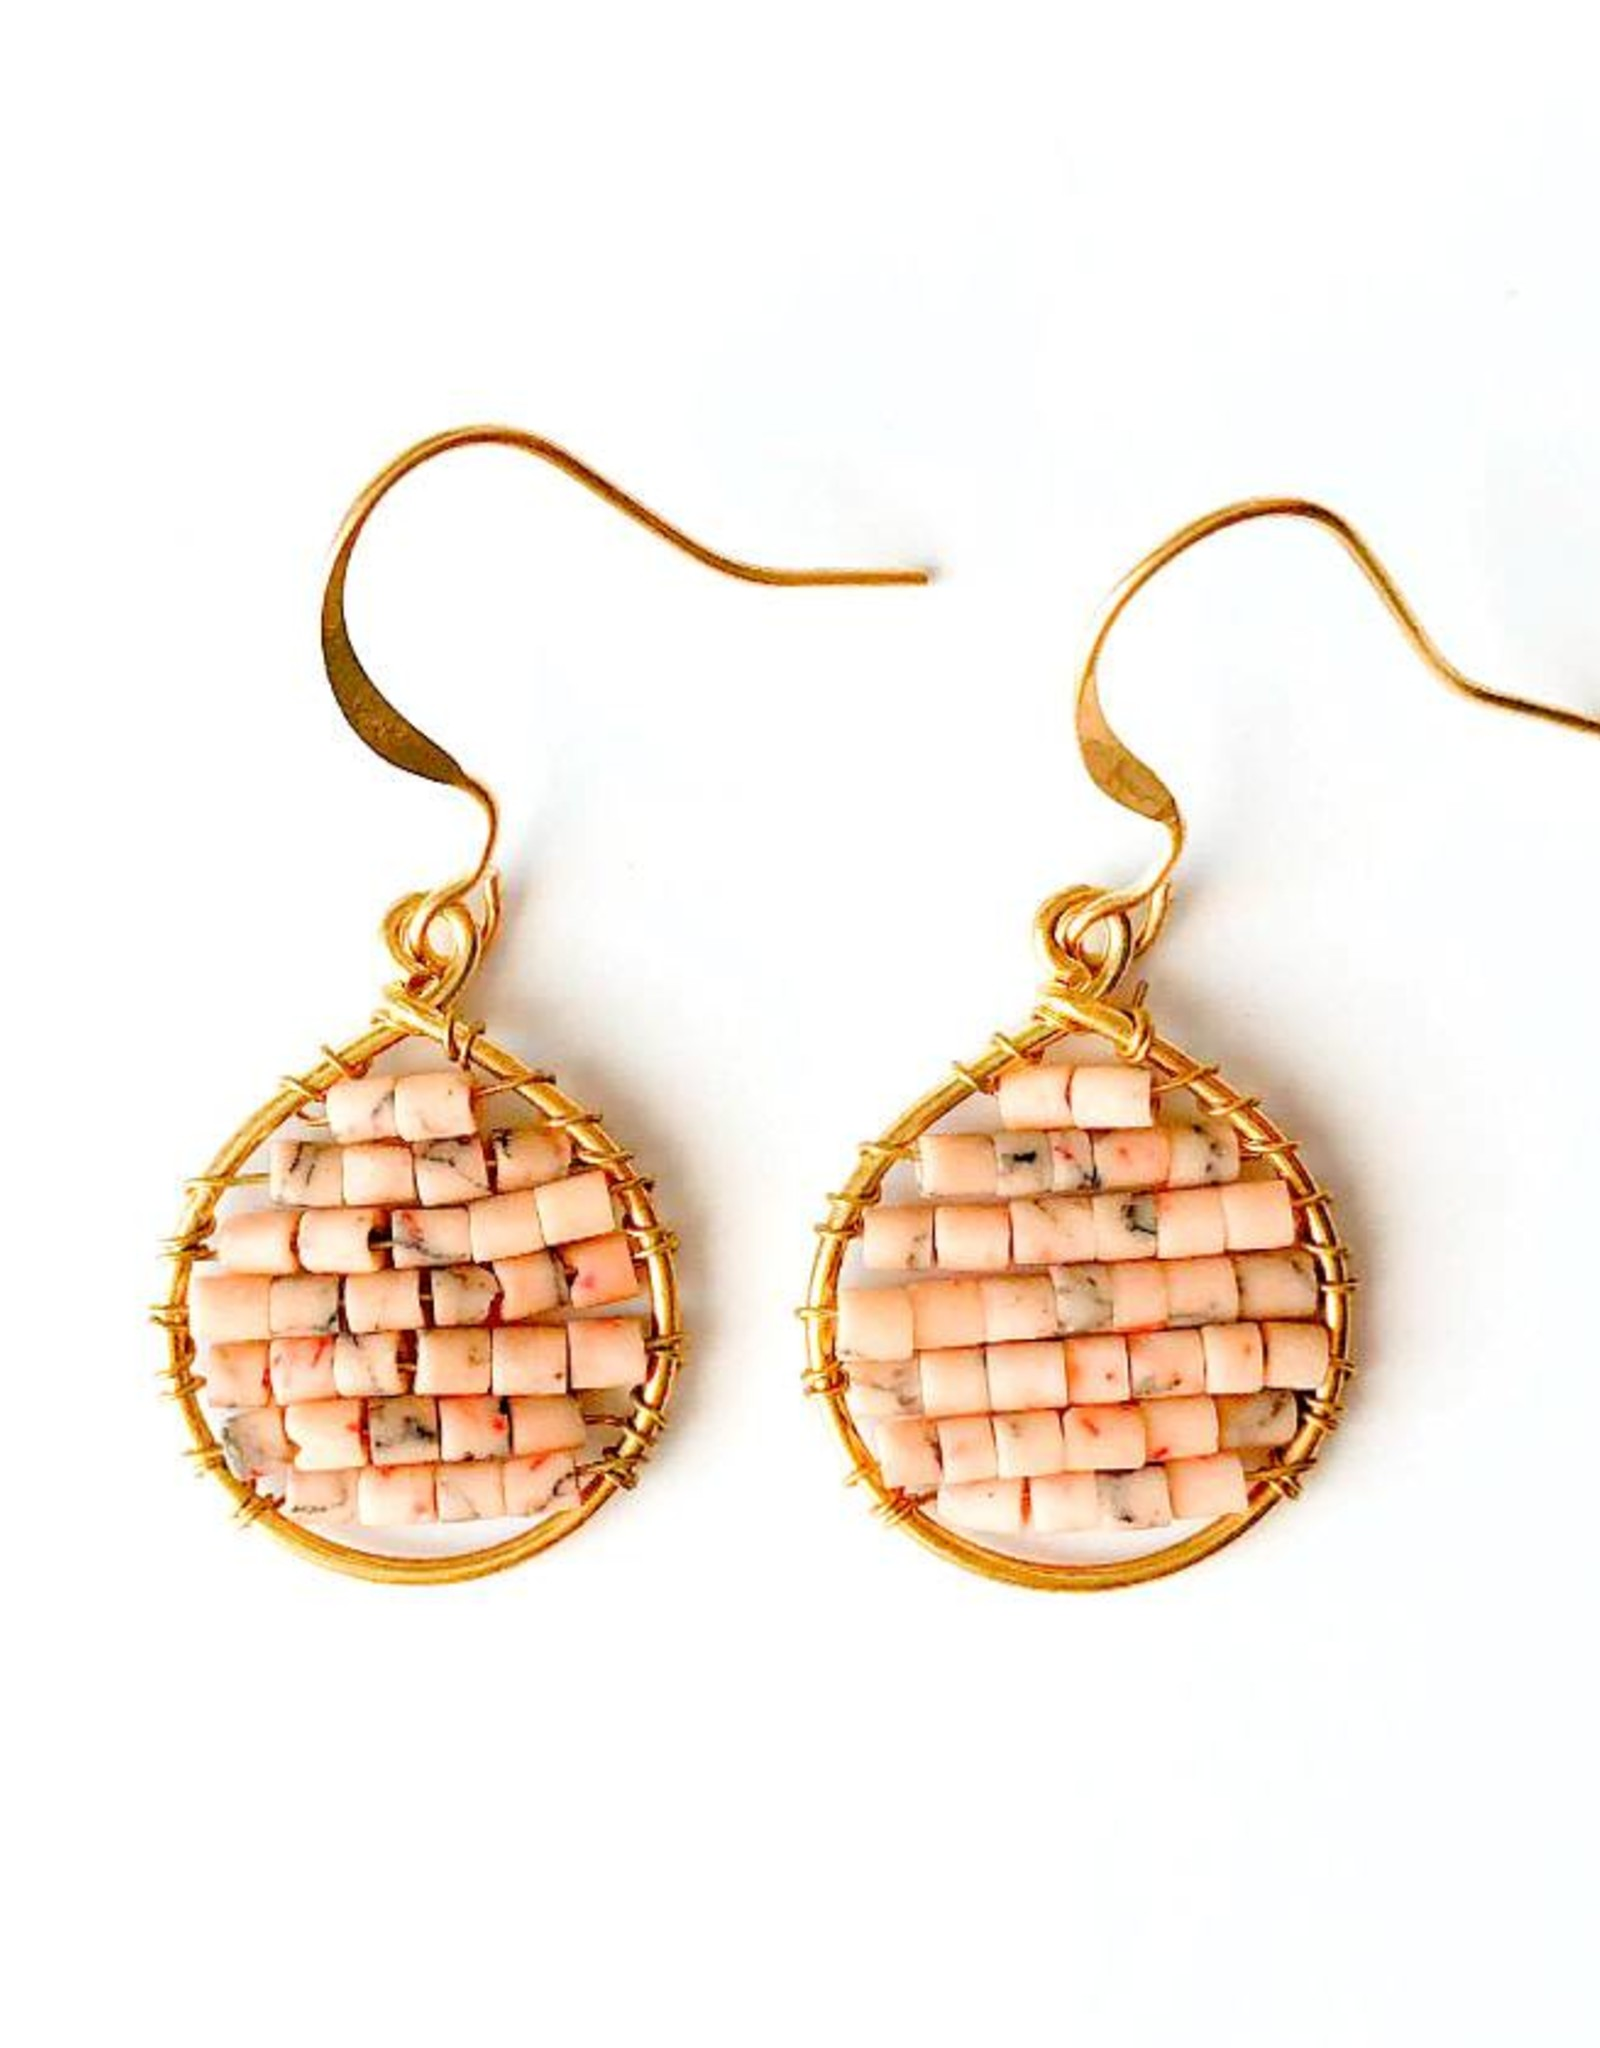 Hinth Oorbellen Lek goldframe-speckels soft pink